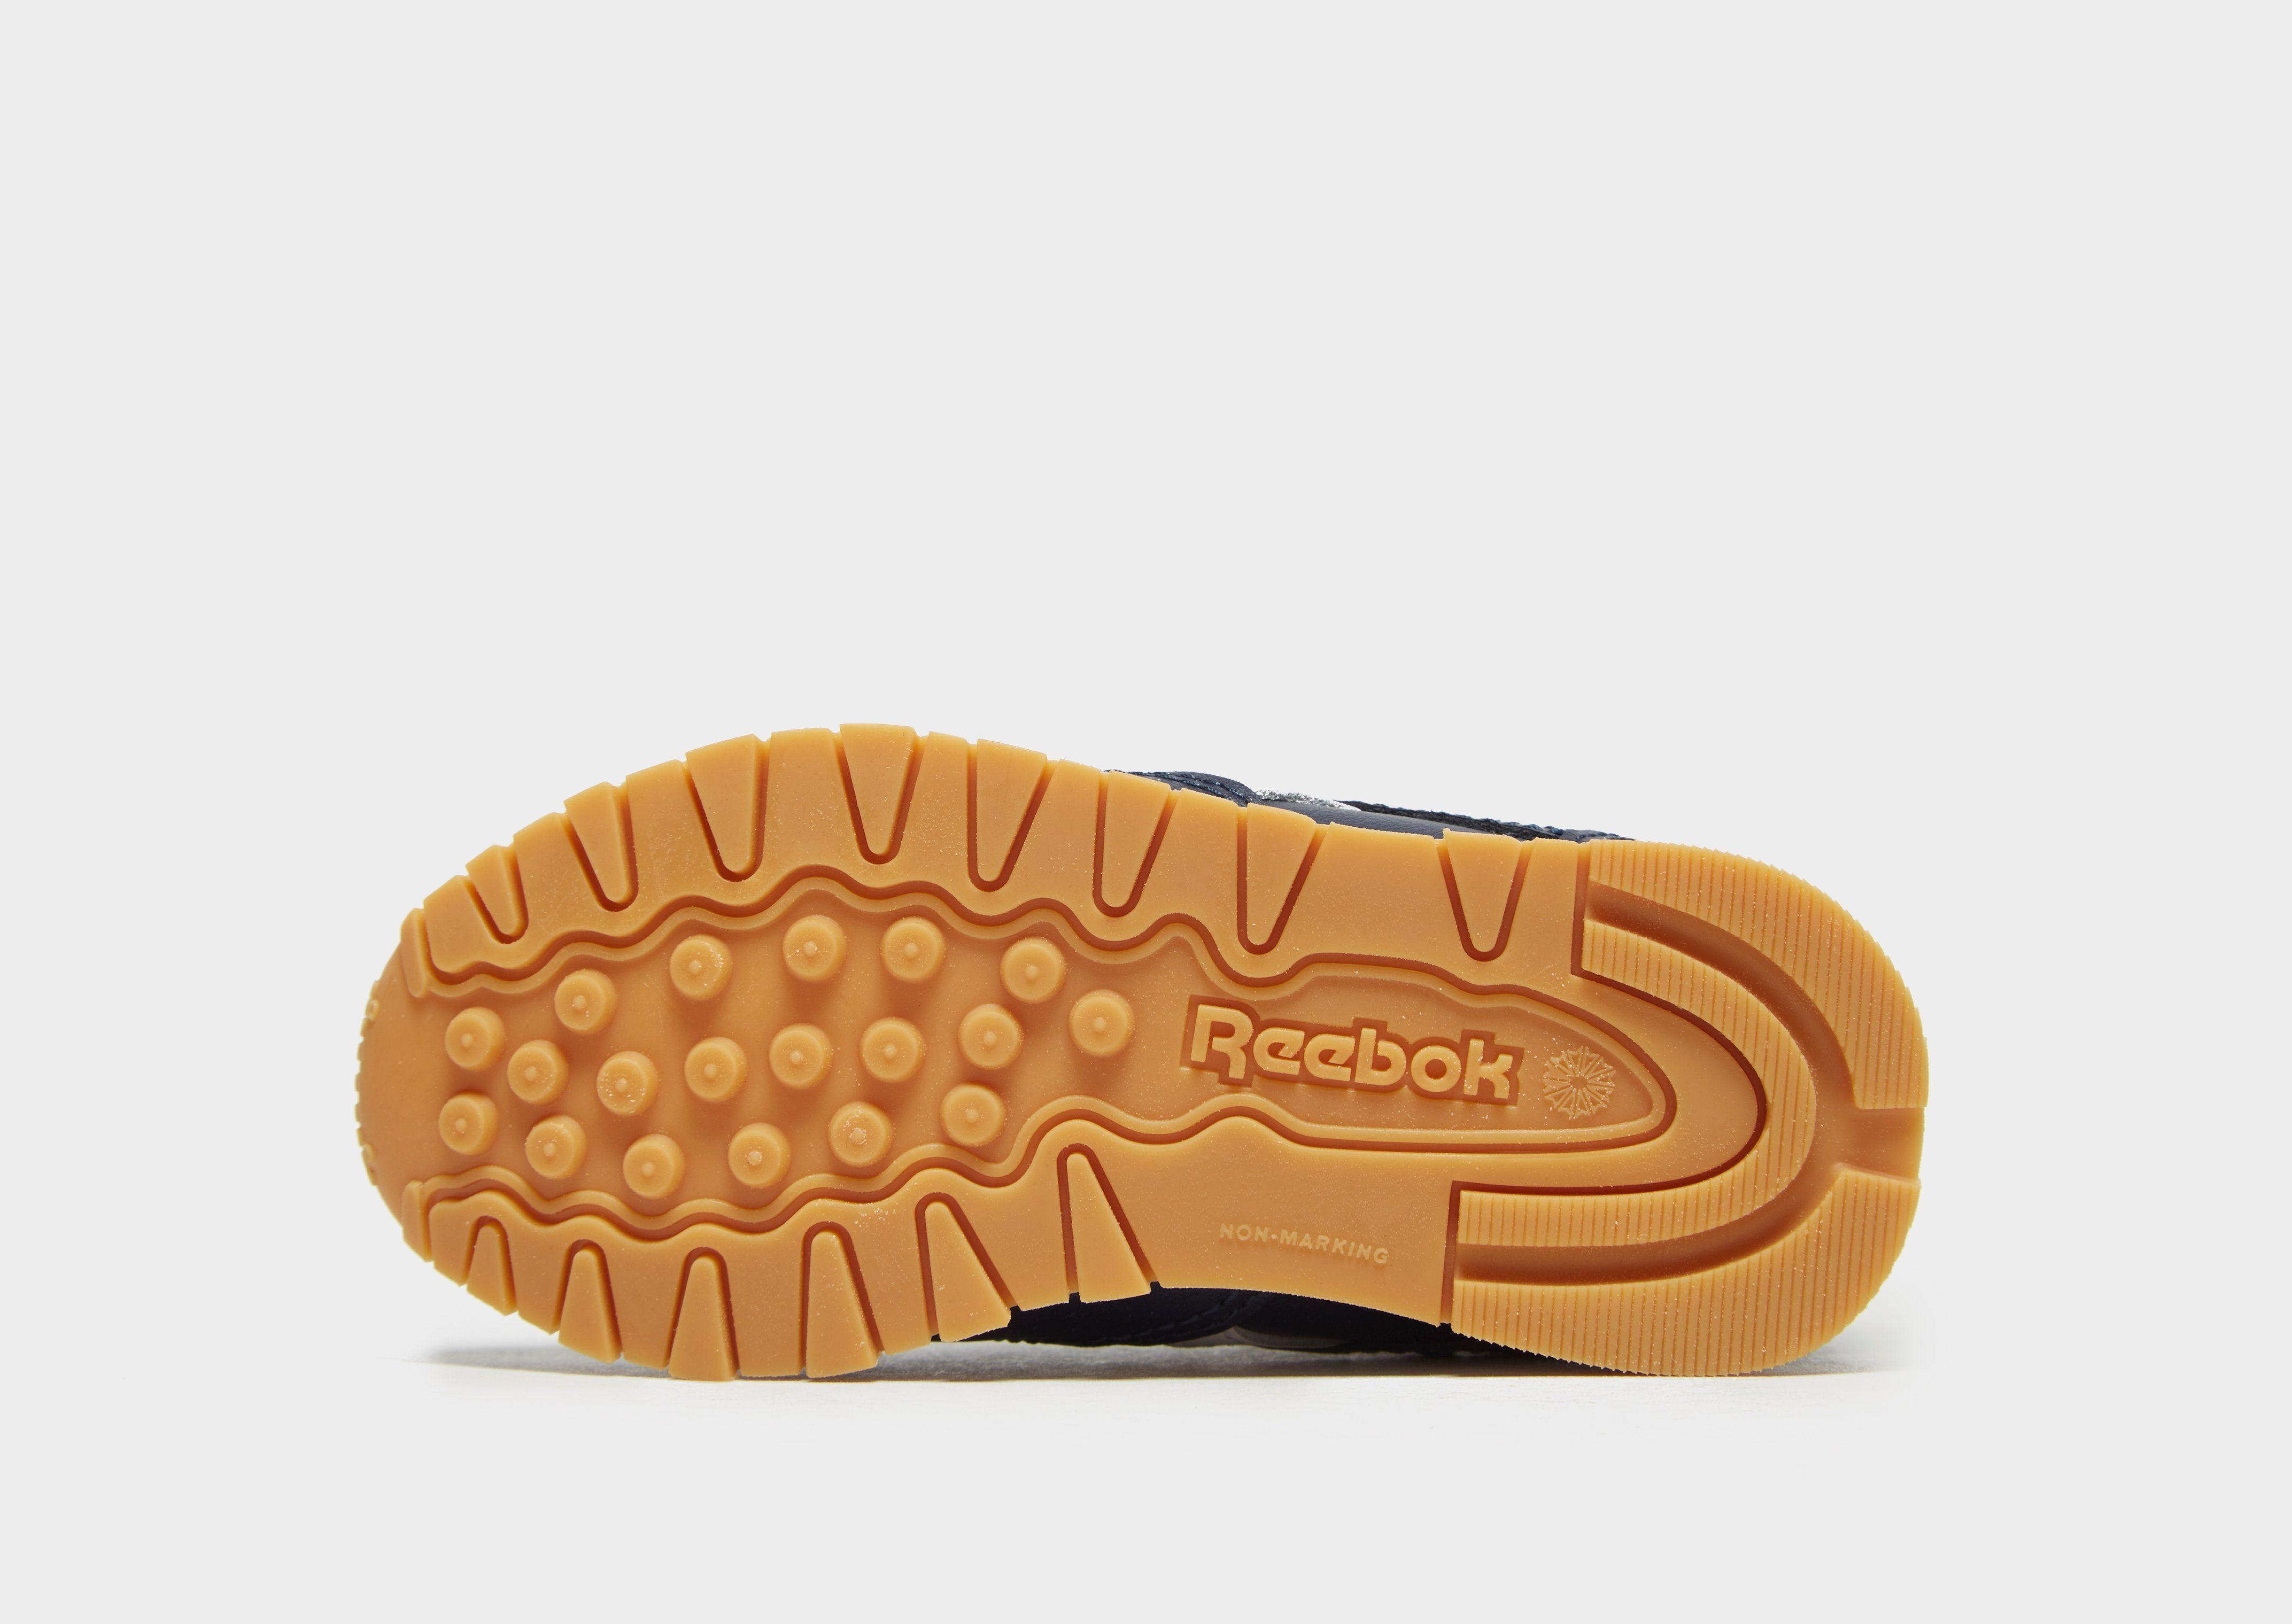 Reebok Classic Leather Infant